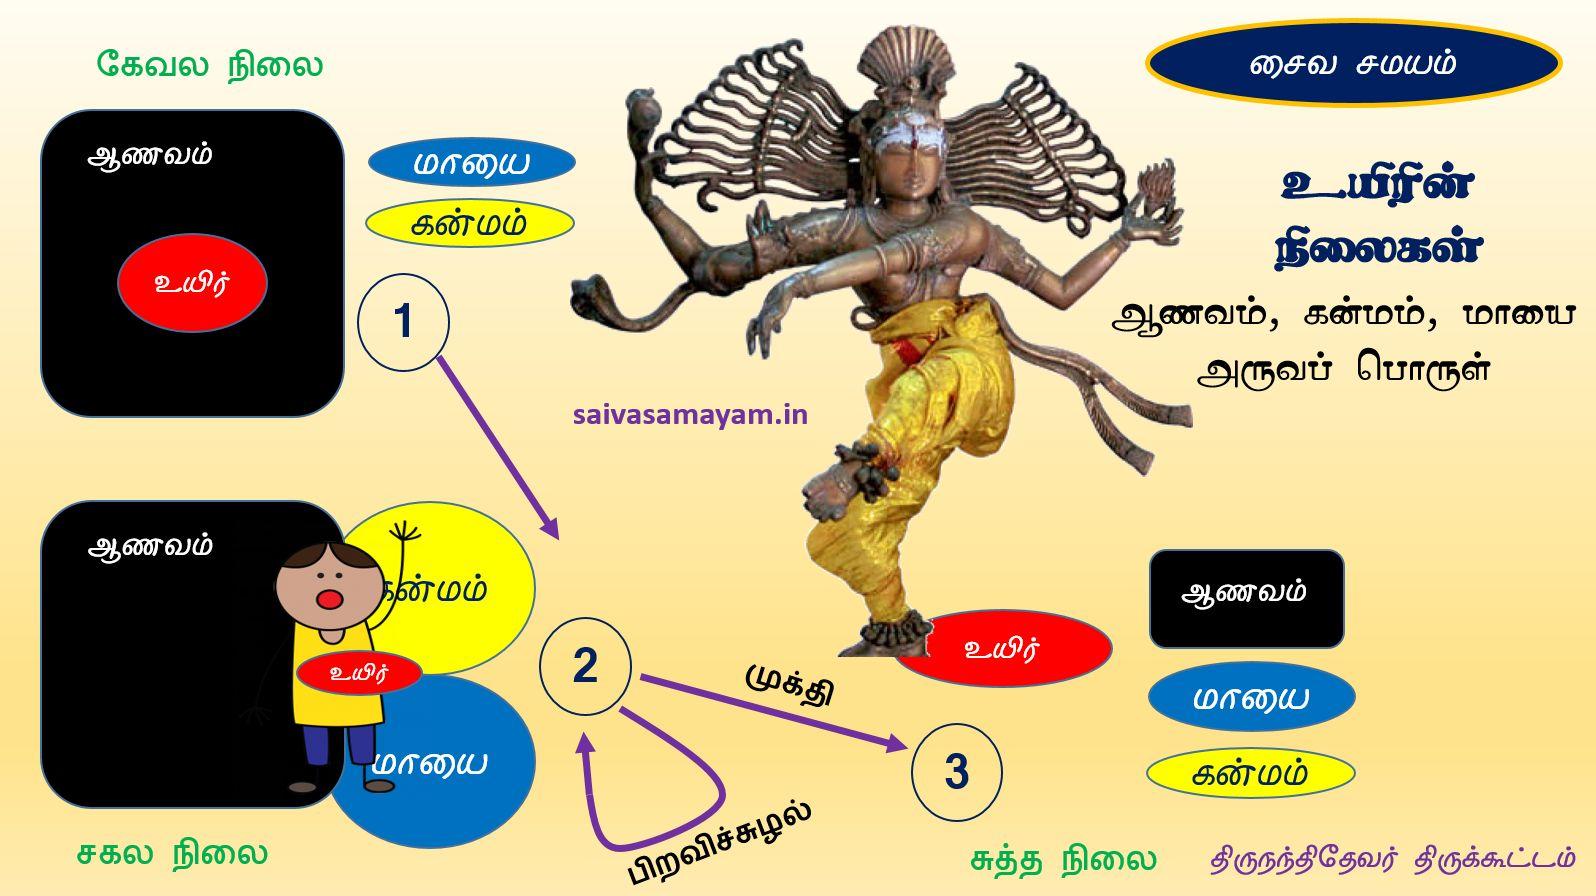 http://www.saivasamayam.in/wp-content/uploads/2017/04/thumbnailpic2.jpg